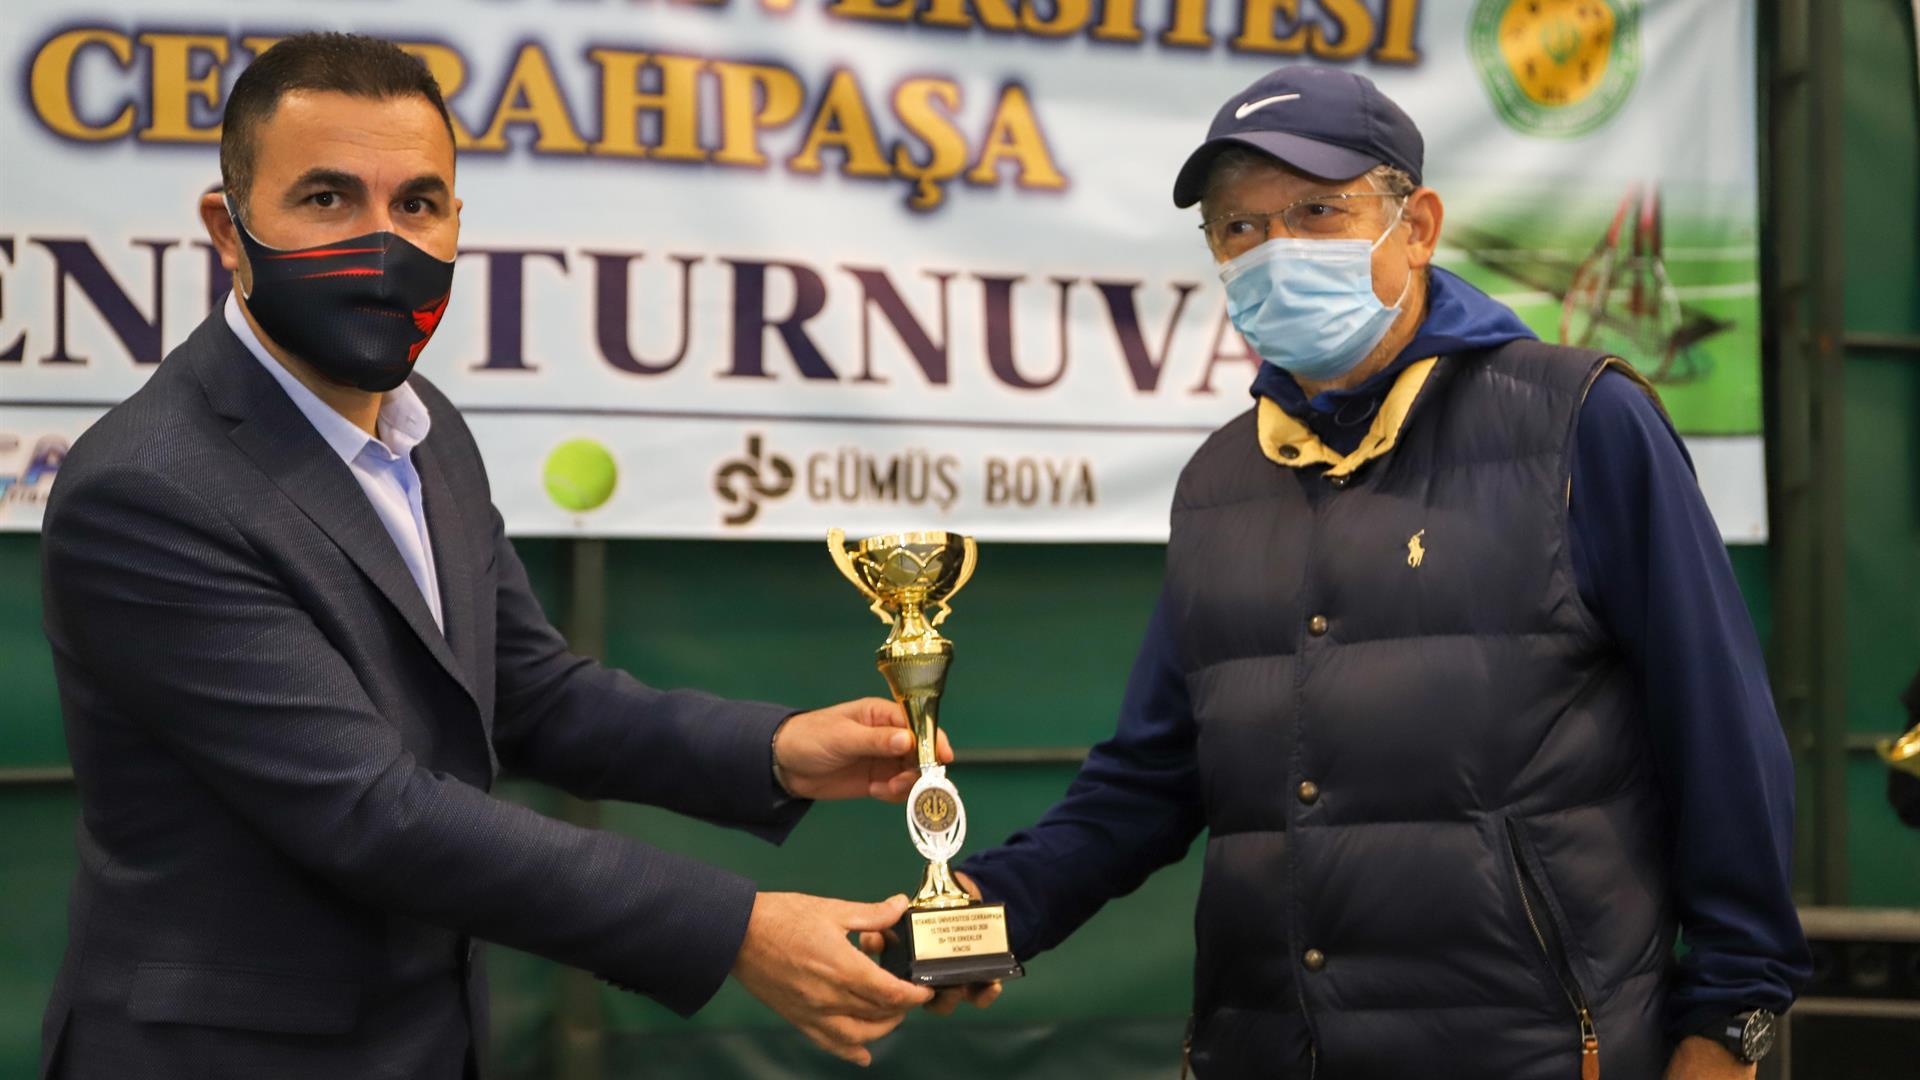 "{""Header"":""İstanbul Üniversitesi- Cerrahpaşa 13. Tenis Turnuvası'nda Kazananlar Belli Oldu"",""Content"":null,""Link"":""https://istanbulc.edu.tr/tr/haber/istanbul-universitesi-cerrahpasa-13-tenis-turnuvasinda-kazananlar-belli-oldu-7500490065004A004B0074005600790035006F00720039007900700046006200610041004F003200370077003200"",""IsBlank"":false,""Img"":""KsDFaVVZgkubd0_48vctjg"",""Gallery"":null,""Date"":""2020-11-19T15:57:02"",""Tag"":[],""Tags"":"""",""Title1"":null,""Title2"":null,""Title3"":null,""Titles"":null,""IsPublic"":false,""Author"":null,""PriorityOrder"":null,""IsPublish"":false,""IsIUadmin"":false,""IsViewerWholePublisher"":false,""IsAmfi"":false,""Route"":""istanbul-universitesi-cerrahpasa-13-tenis-turnuvasinda-kazananlar-belli-oldu-6200340038006C0068006B004400620071004800370039007900700046006200610041004F003200370077003200"",""PreviewRoute"":""istanbul-universitesi-cerrahpasa-13-tenis-turnuvasinda-kazananlar-belli-oldu-637545144941649453-6200340038006C0068006B004400620071004800370039007900700046006200610041004F003200370077003200"",""Keywords"":"""",""EID"":""6200340038006C0068006B004400620071004800370039007900700046006200610041004F003200370077003200"",""CreatedUser"":"""",""ModifiedUser"":"""",""CreatedDate"":null,""ModifiedDate"":null}"